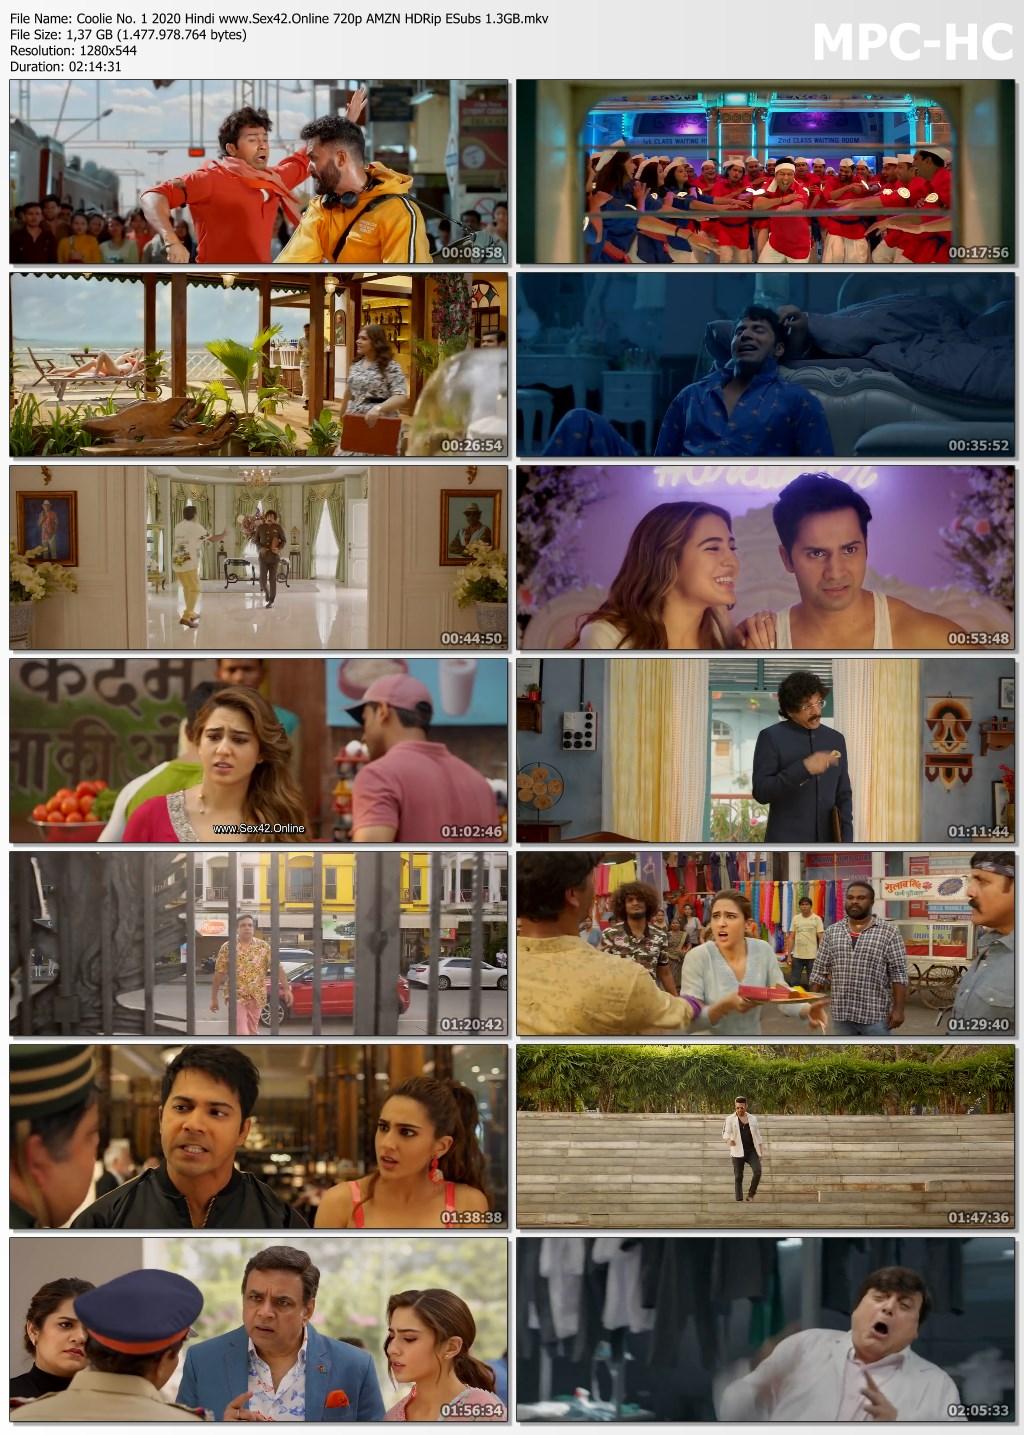 Coolie-No-1-2020-Hindi-www-Sex42-Online-720p-AMZN-HDRip-ESubs-1-3-GB-mkv-thumbs